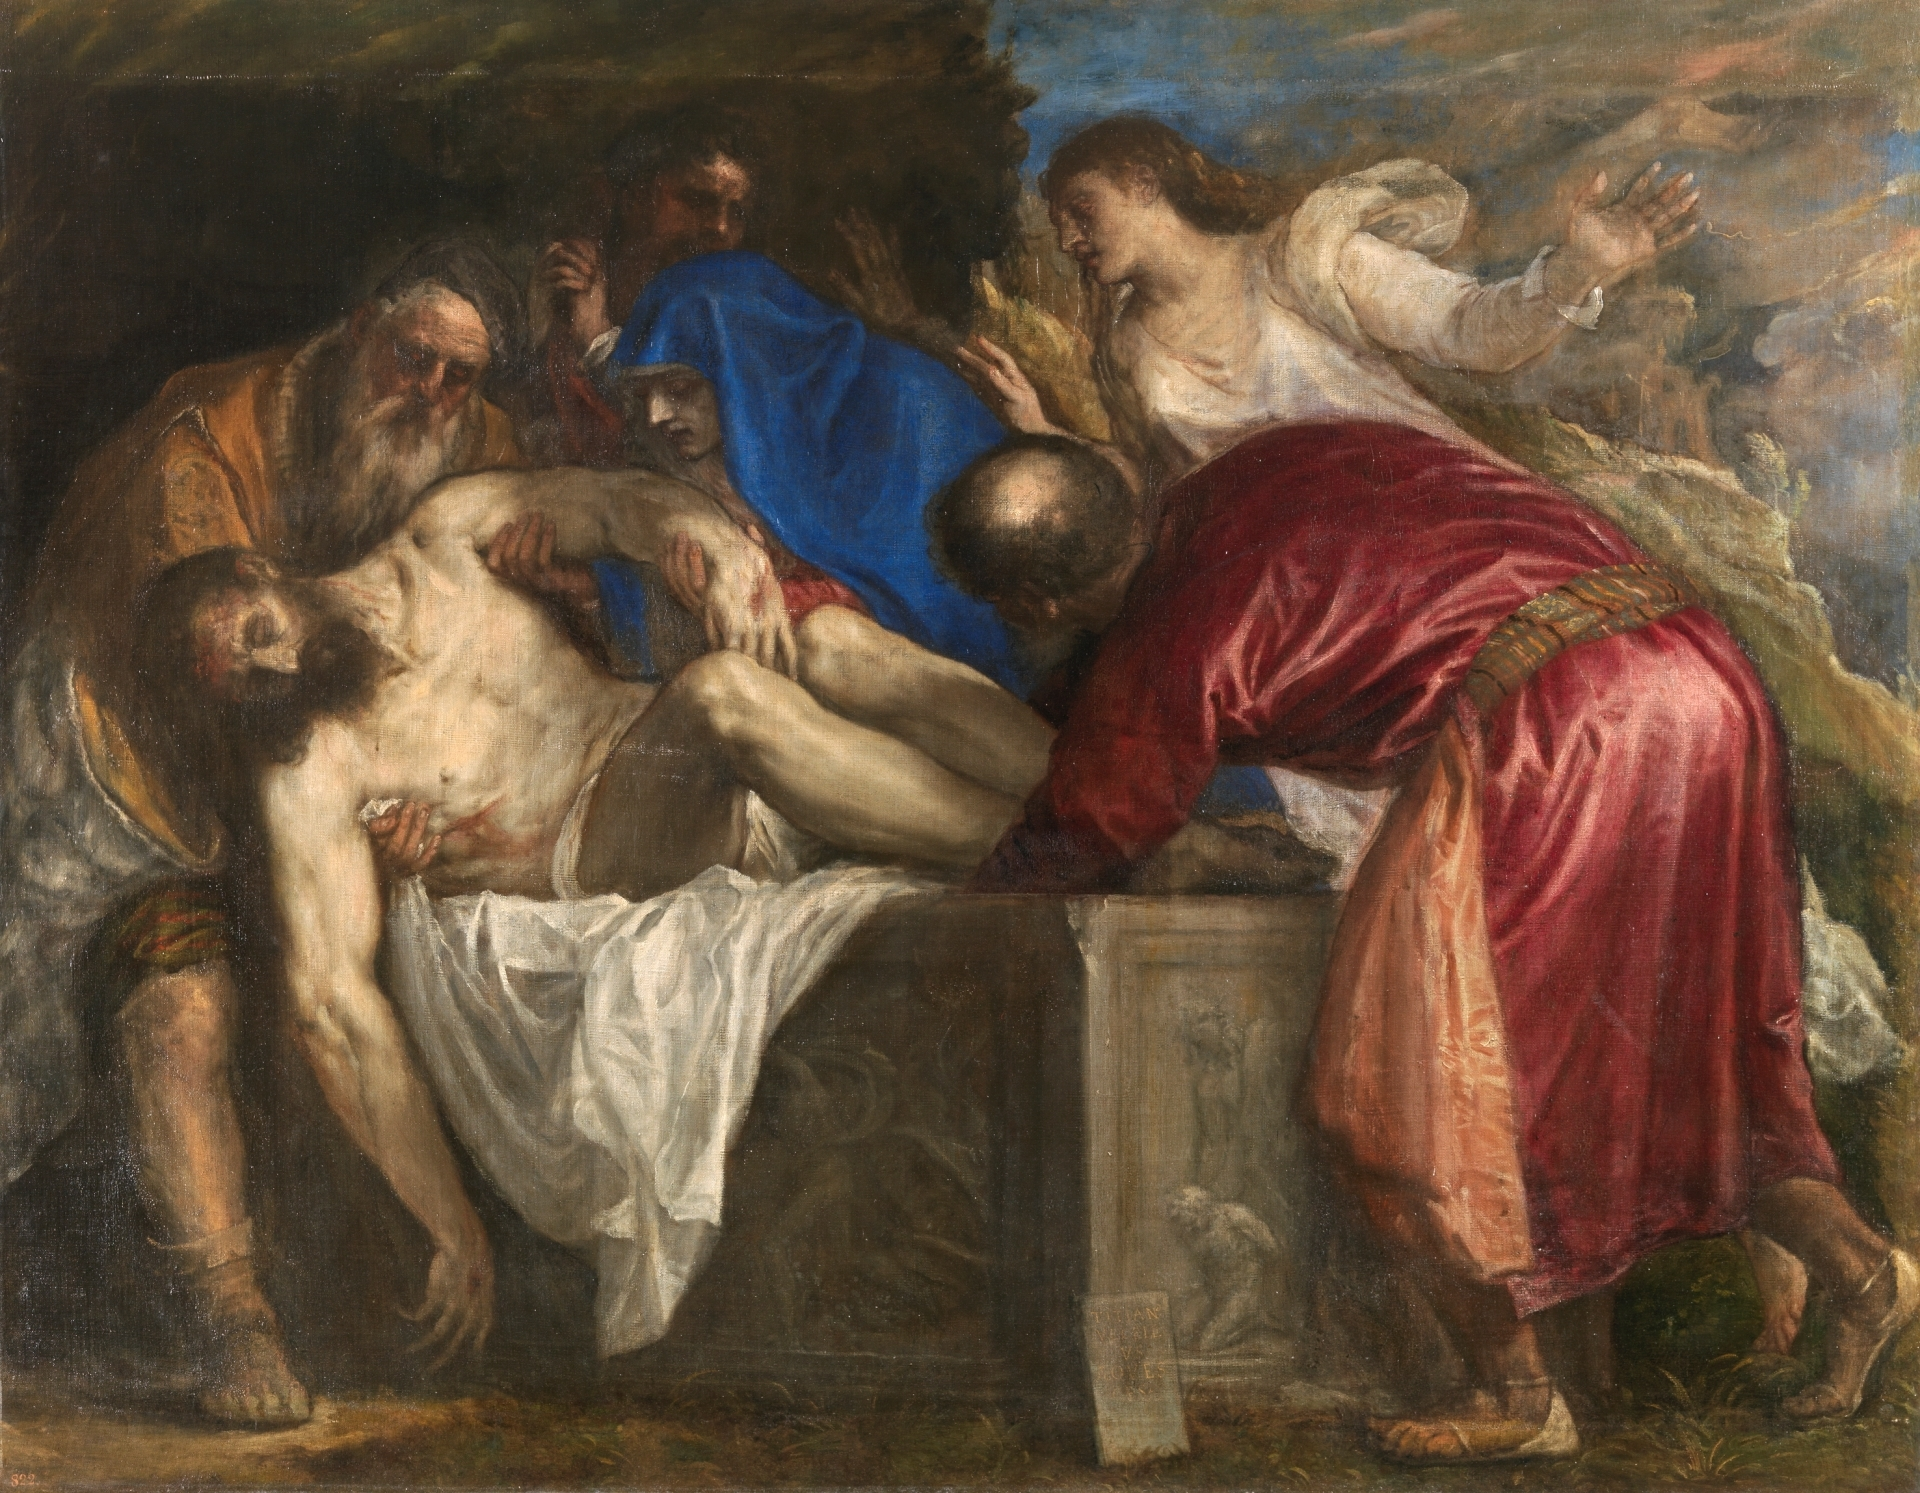 Tiziano - Exposición - Museo Nacional del Prado